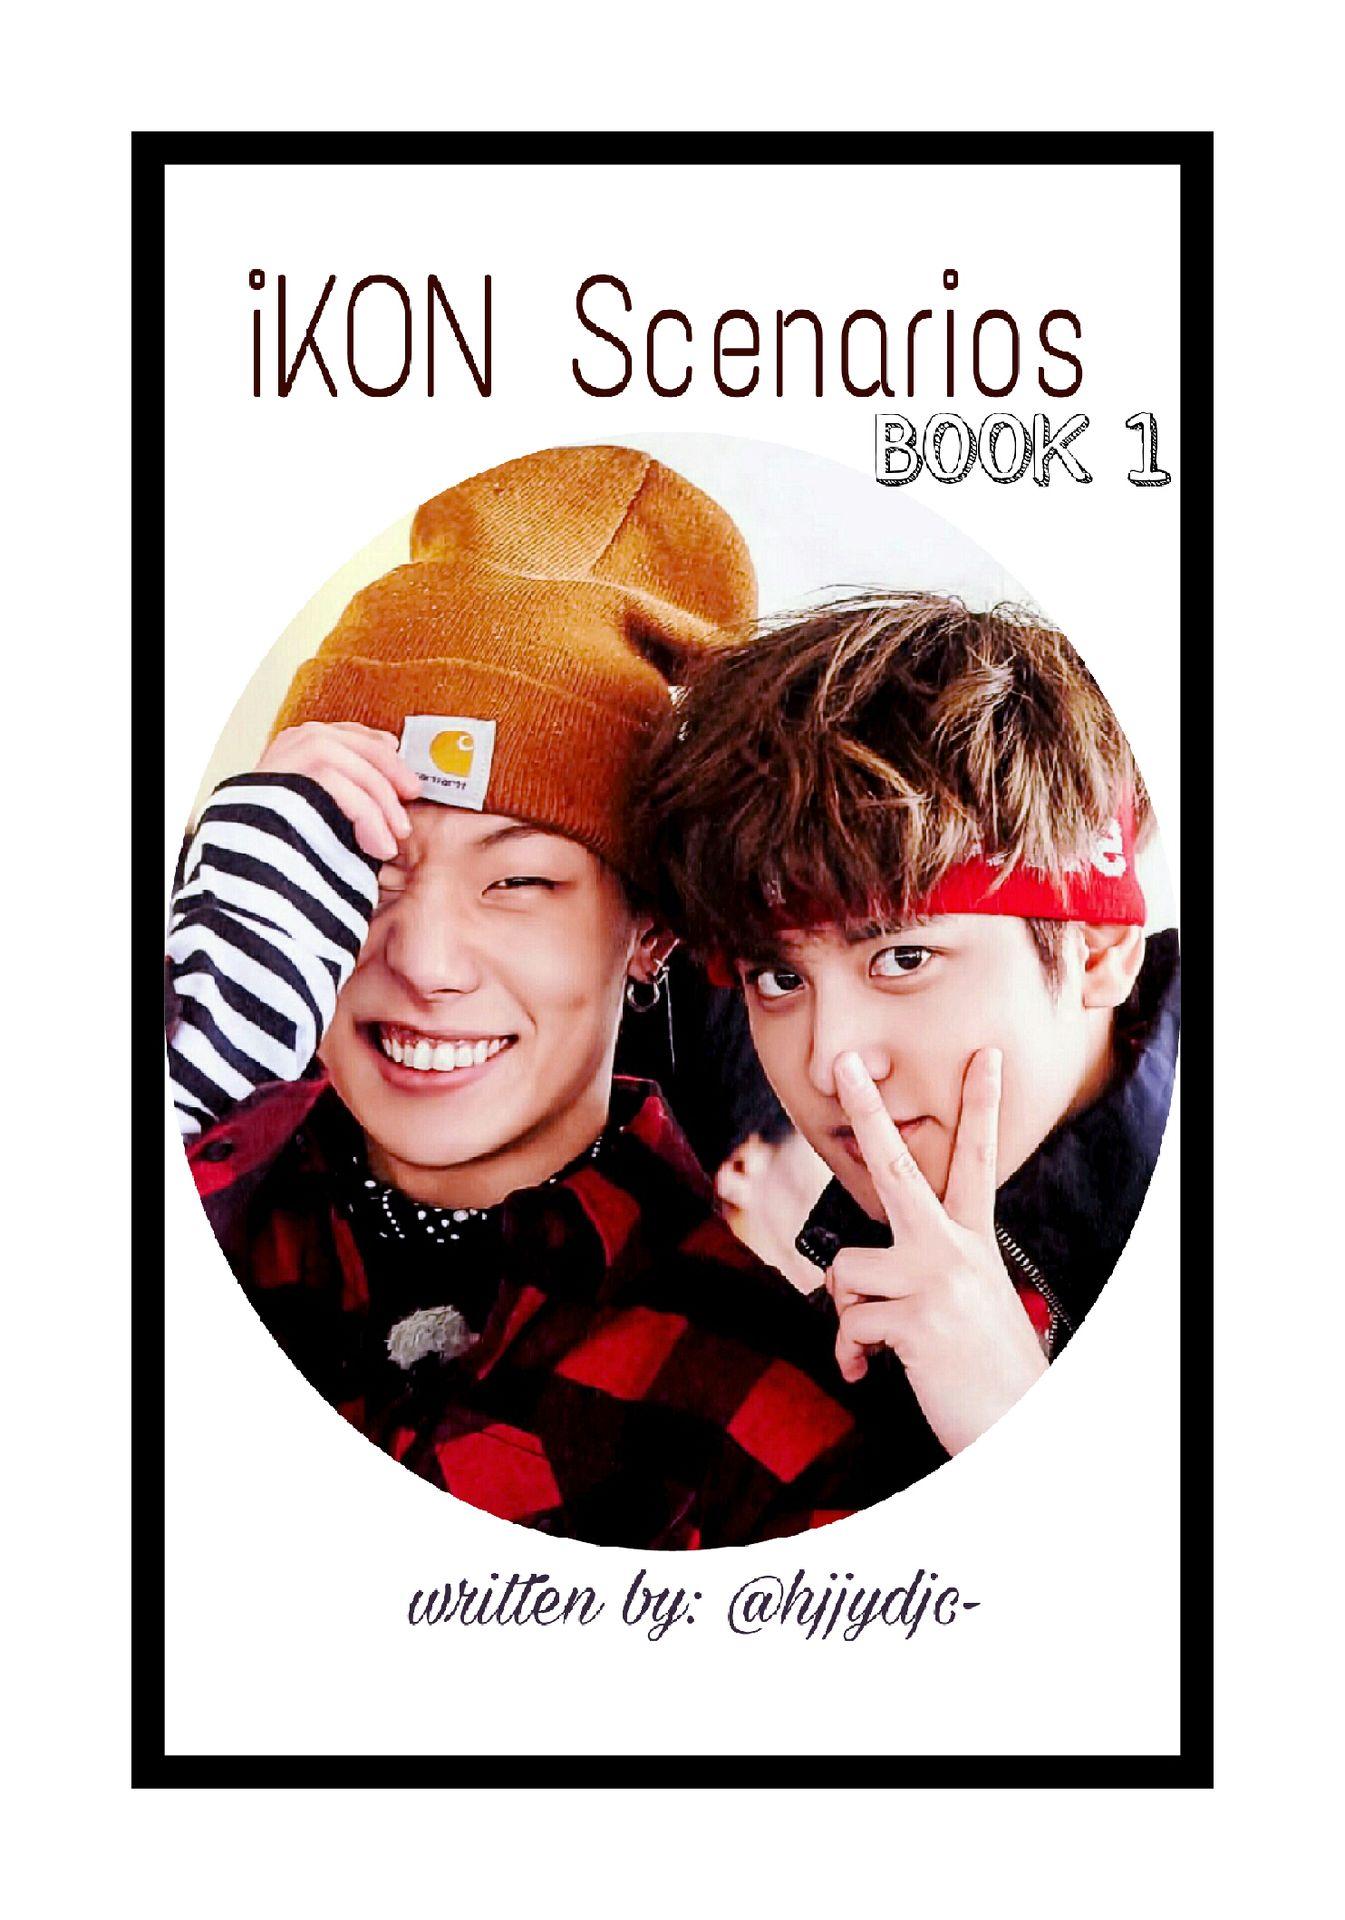 iKON ☆ S C E N A R I O S ☆ - I N T R O - Wattpad